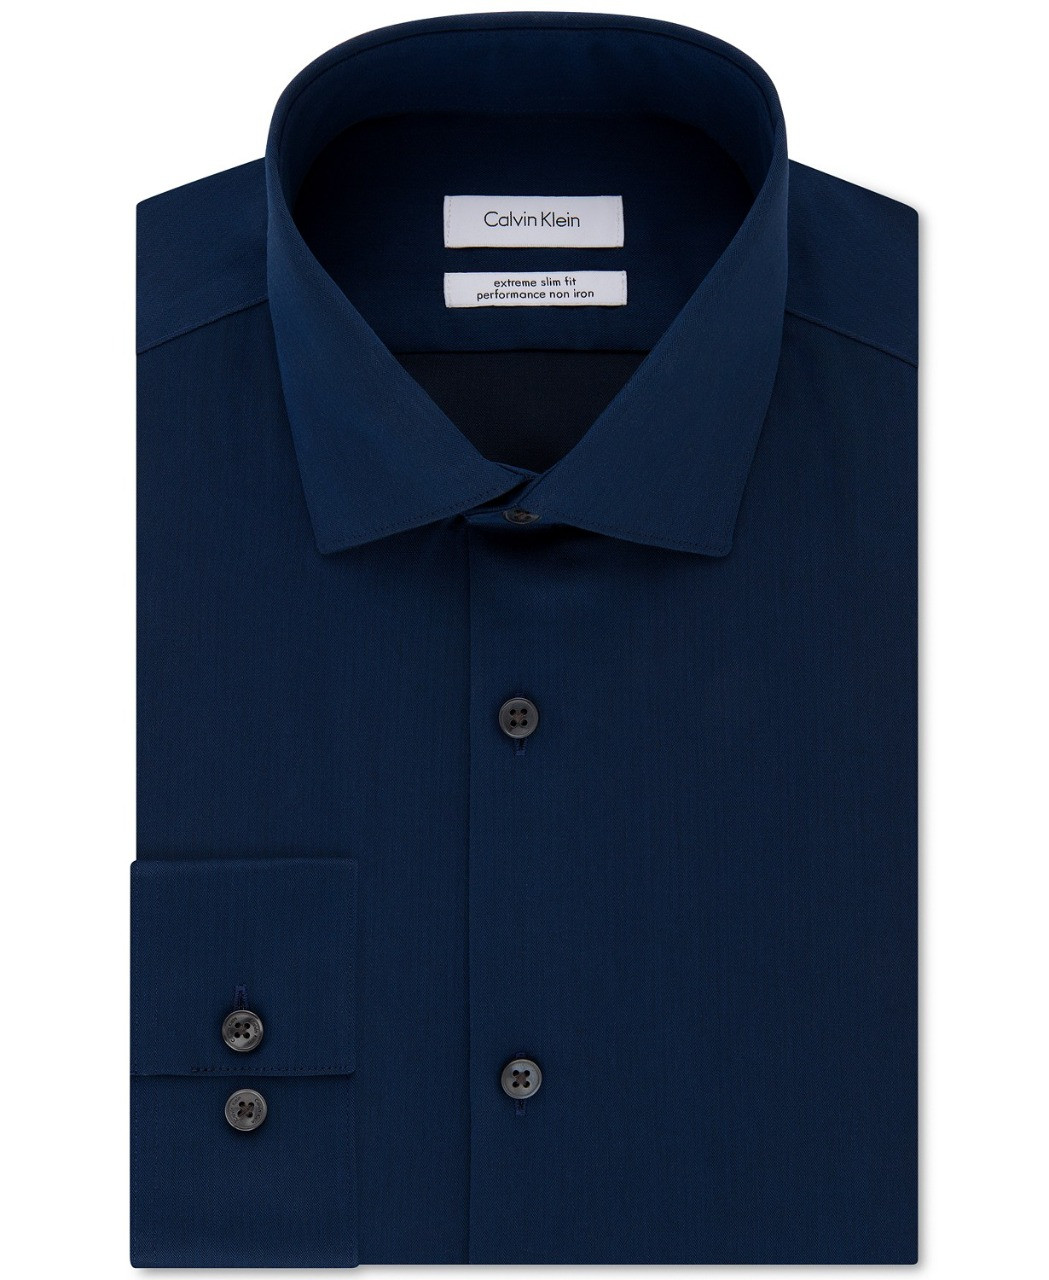 Calvin Klein Рубашка мужская 2000000342597 - фото 2